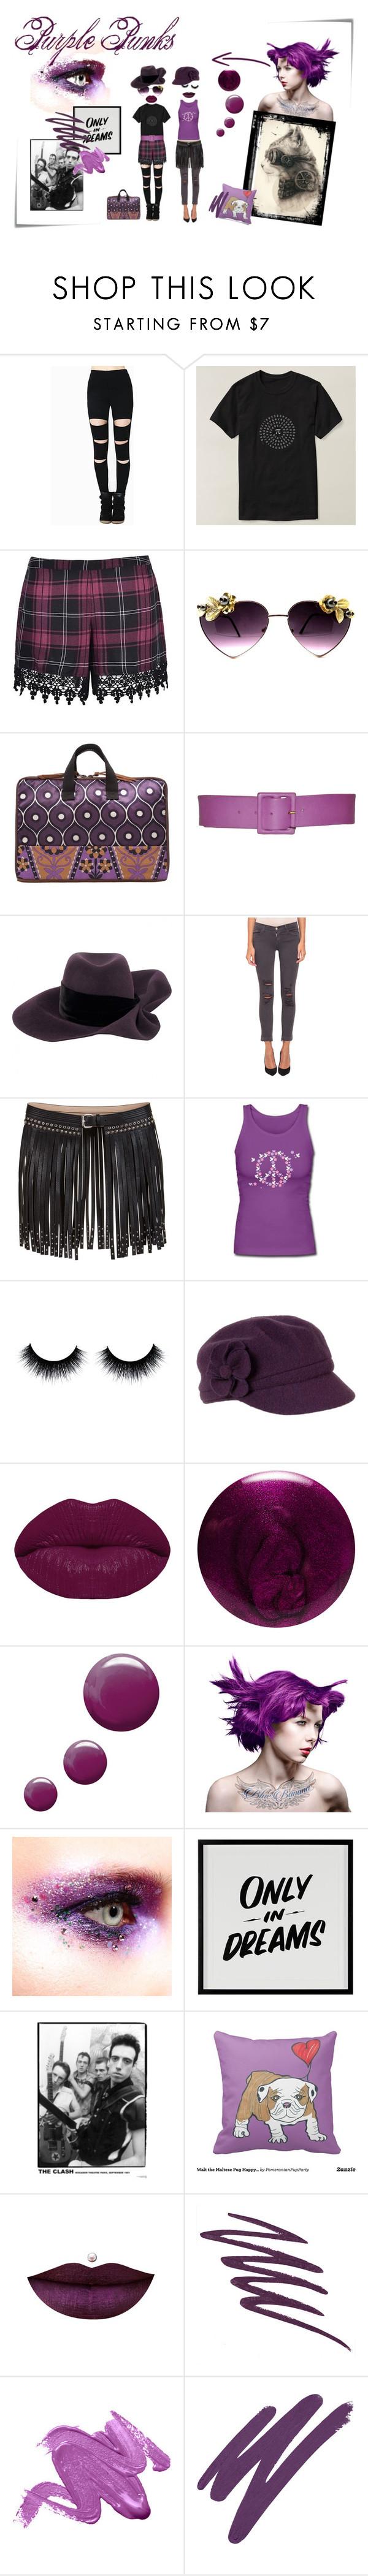 """Purple Punks"" by silkester on Polyvore featuring Mode, Ally Fashion, Yves Saint Laurent, Louis Vuitton, J Brand, BCBGMAXAZRIA, prAna, Winky Lux, JINsoon und Topshop"